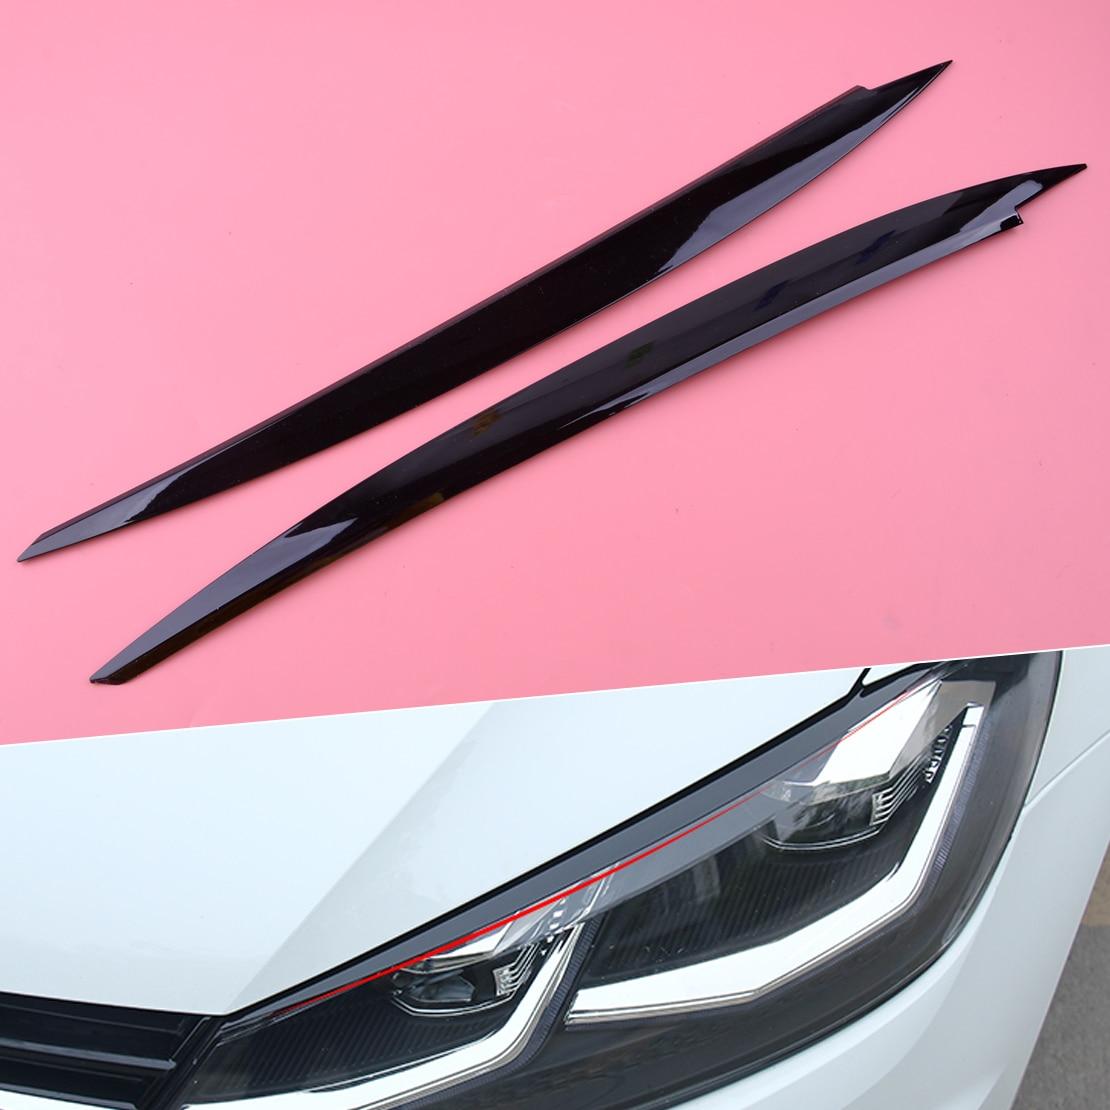 DWCX 2 шт. ABS черная фара для бровей Веки украшения Накладка подходит для VW Golf 7 VII GTI GTD GTE R MK7